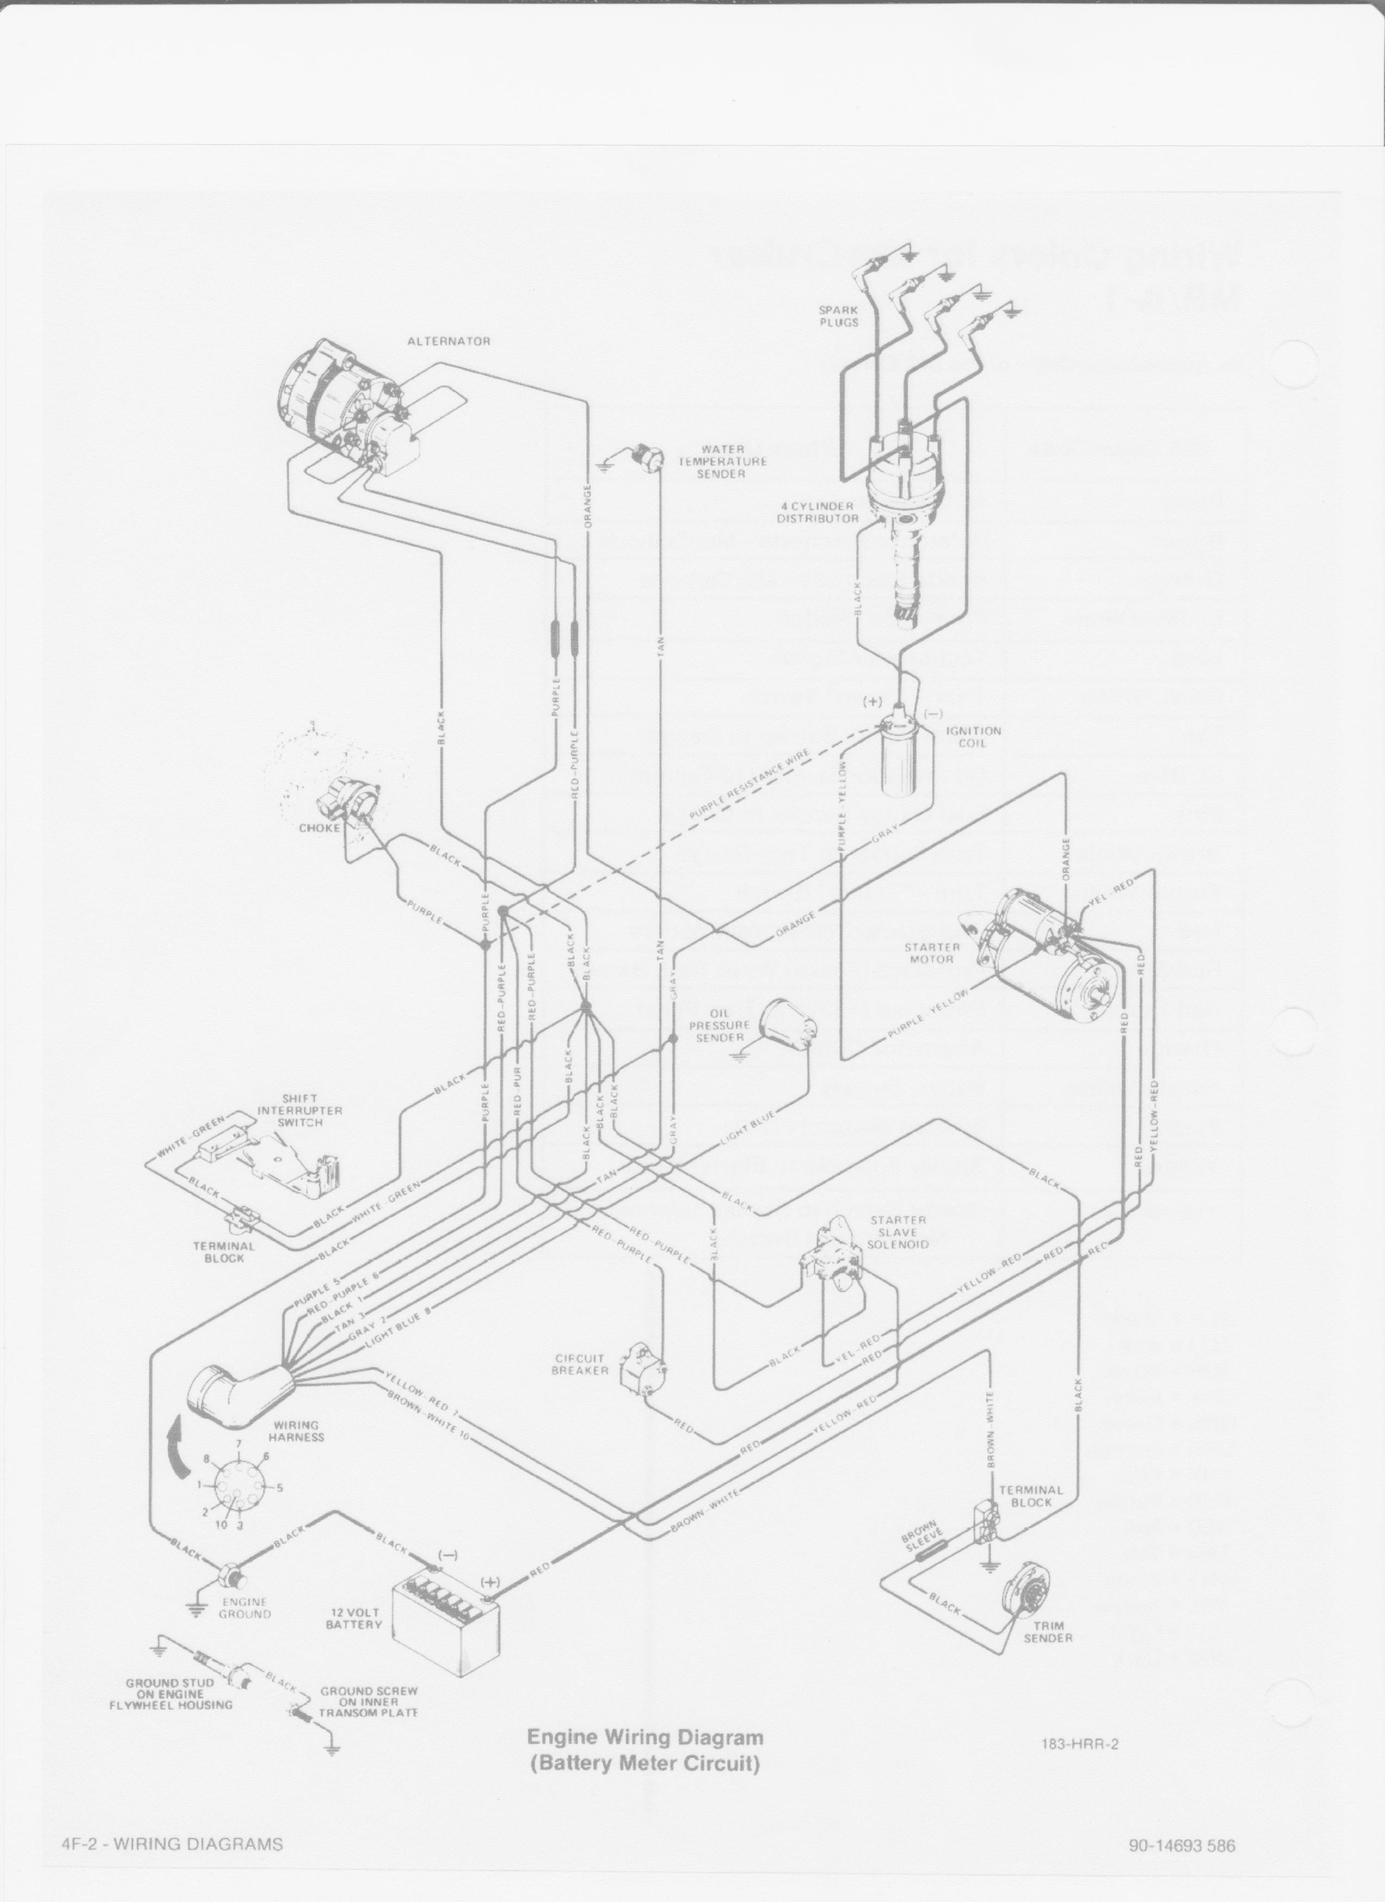 120 Hp Mercruiser Engine Diagram Wiring Diagrams Electrical Electrical Adriengirod Fr